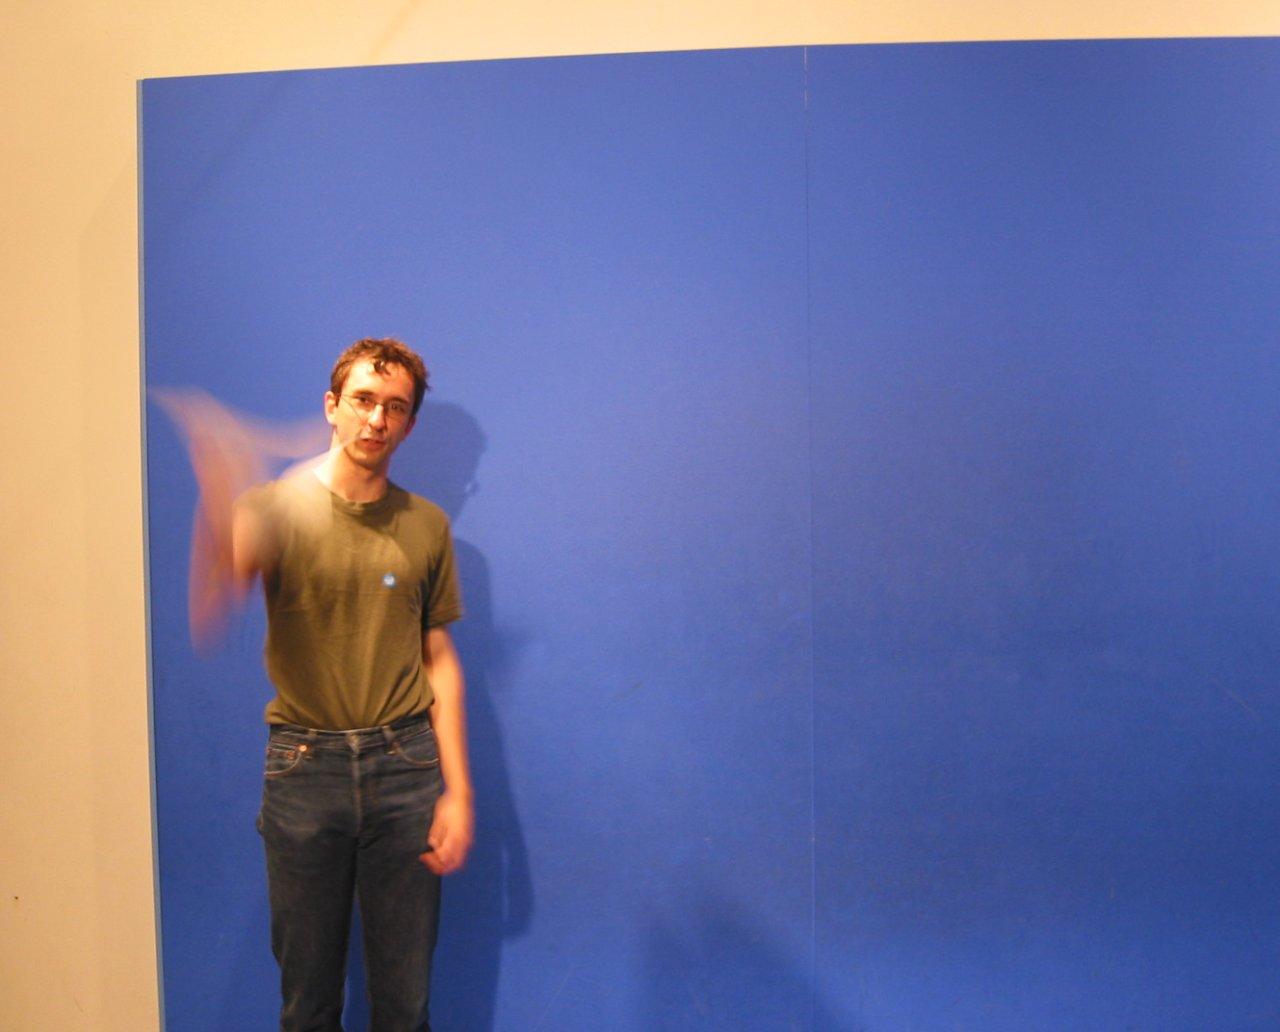 Unduh 87 Koleksi Background Foto Biru Untuk Apa Paling Keren